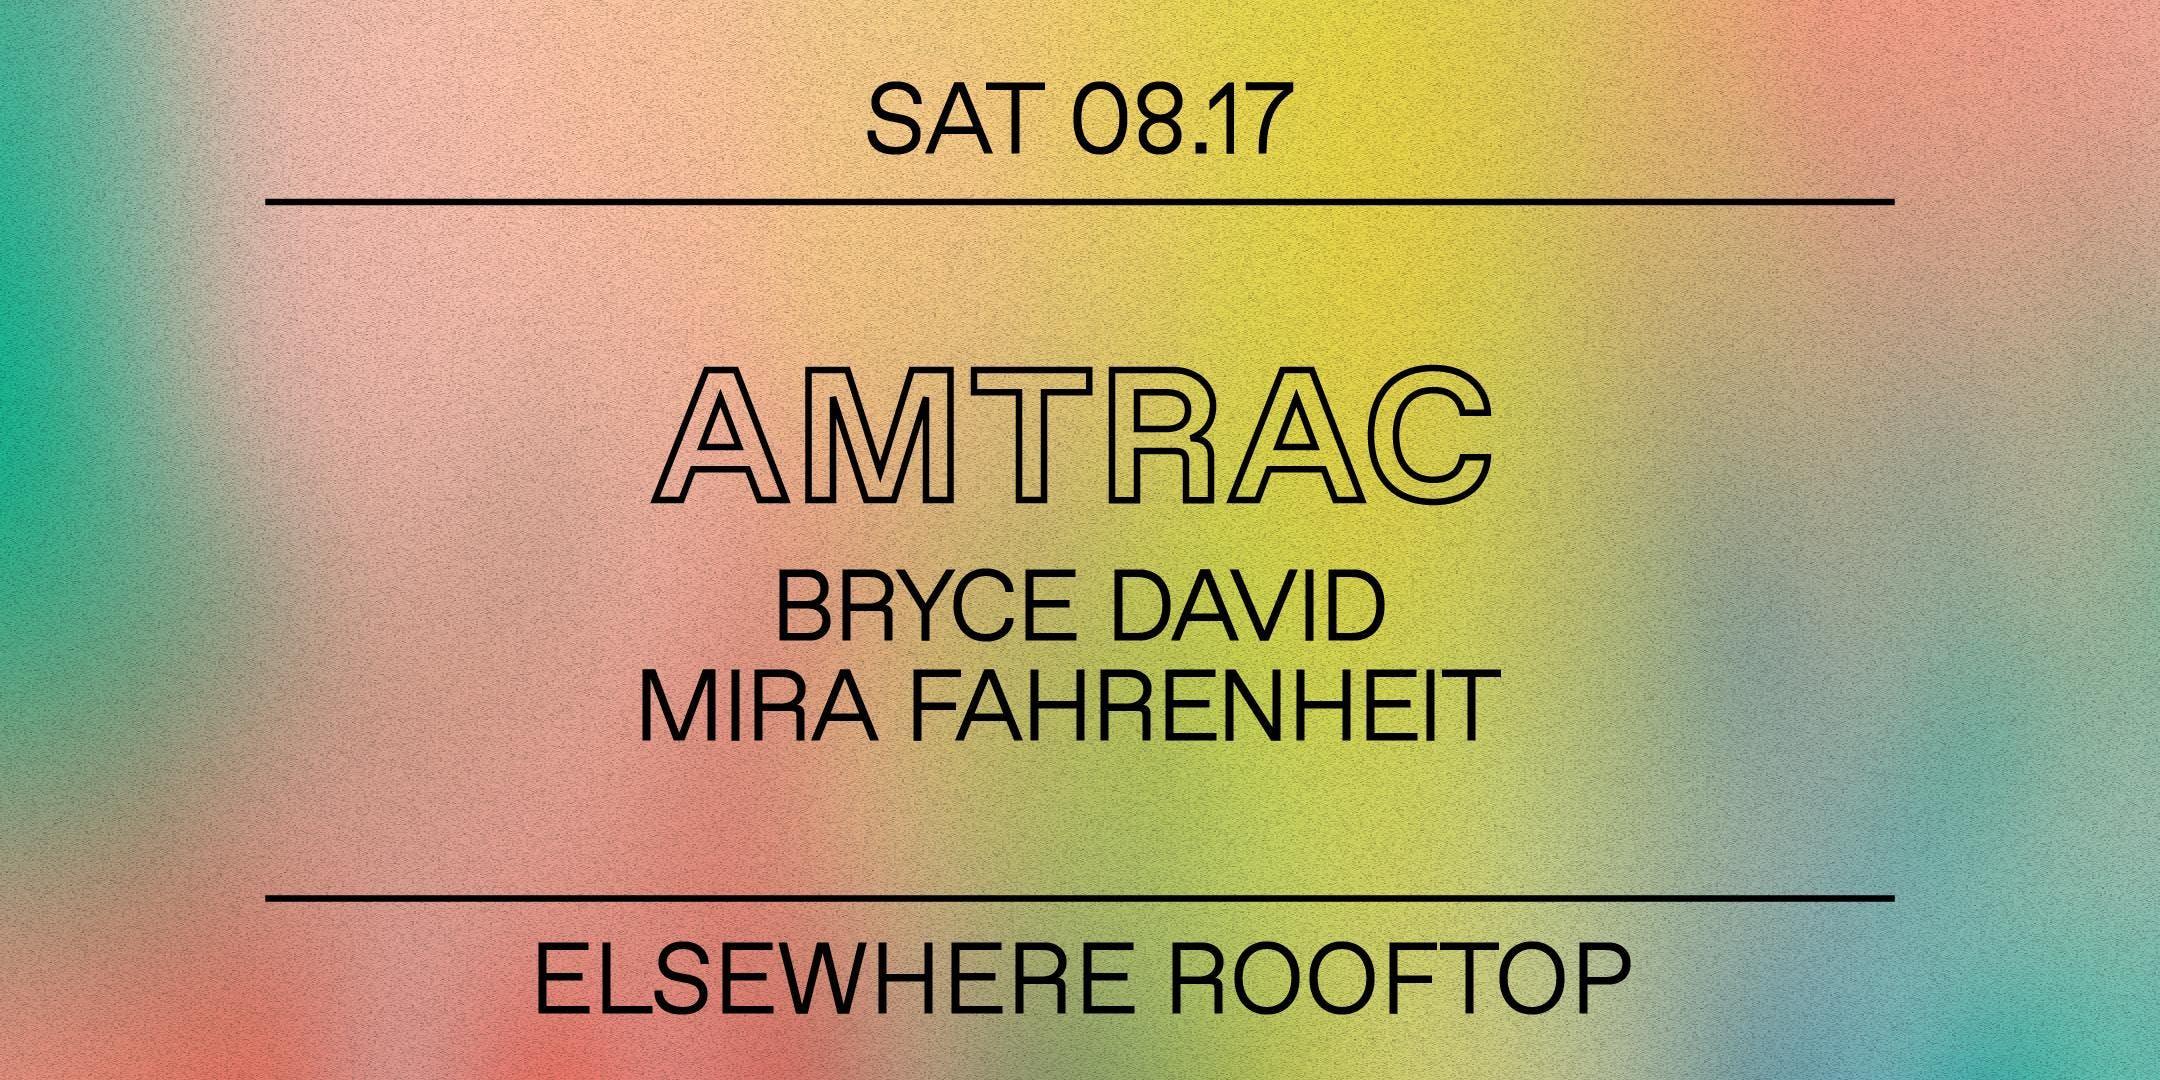 Amtrac, Bryce David & Mira Fahrenheit